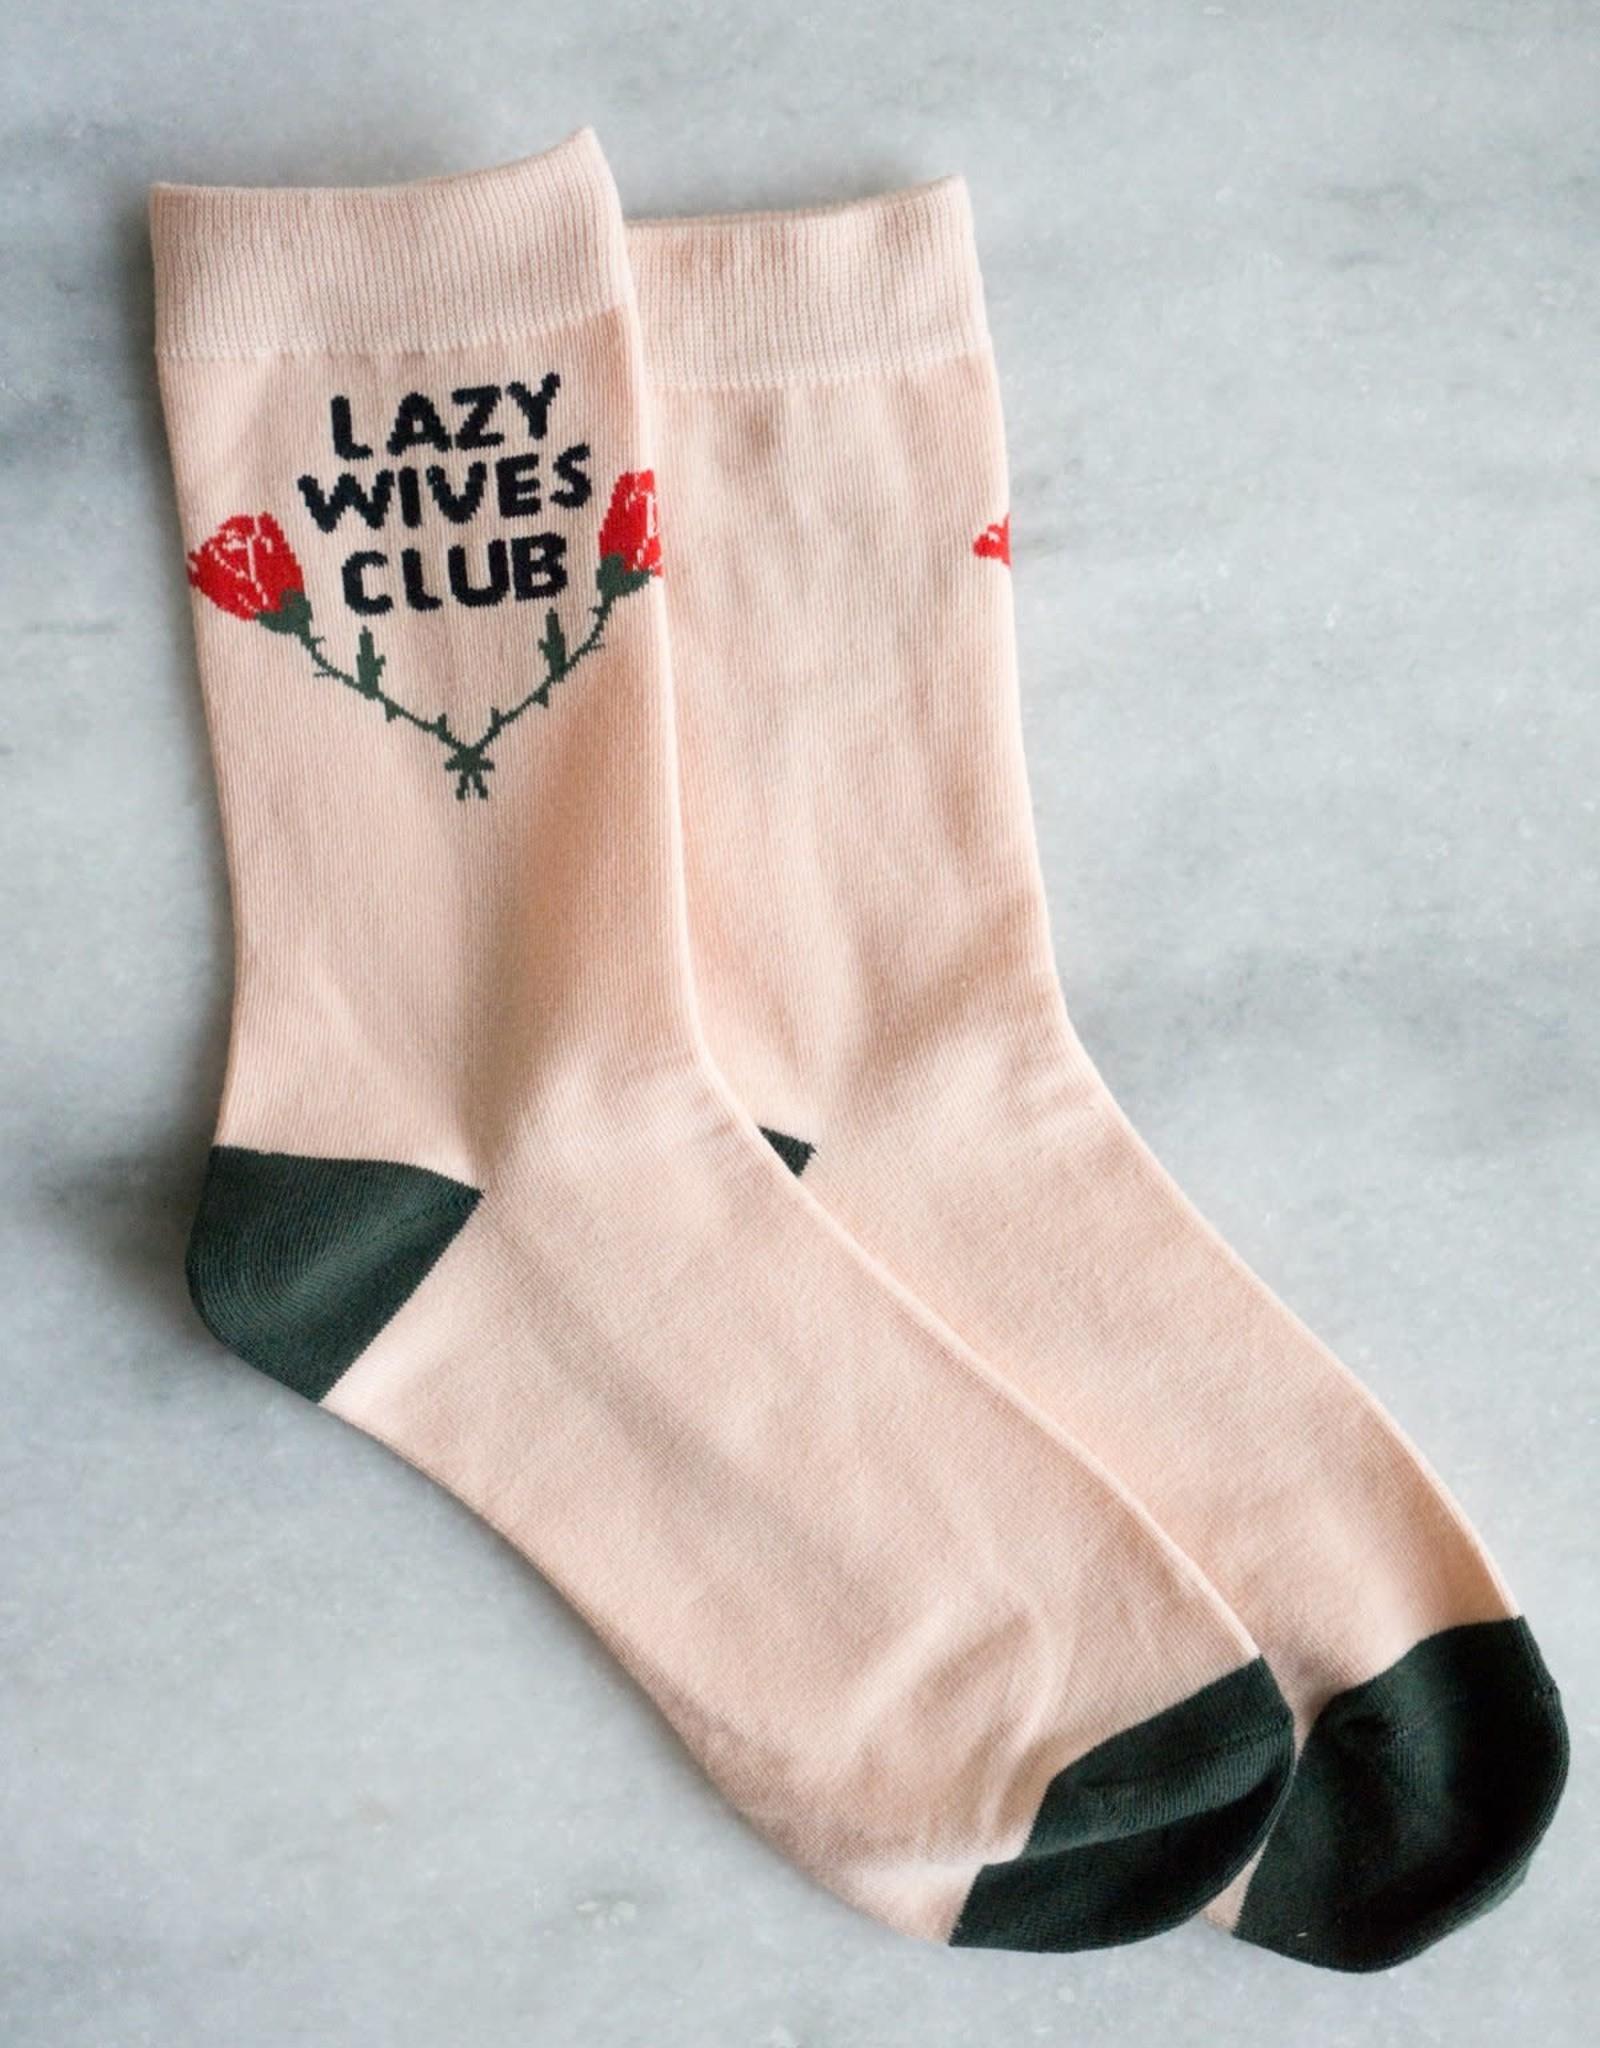 Stay Home Club Stay Home Club | Lazy Wives Club Socks